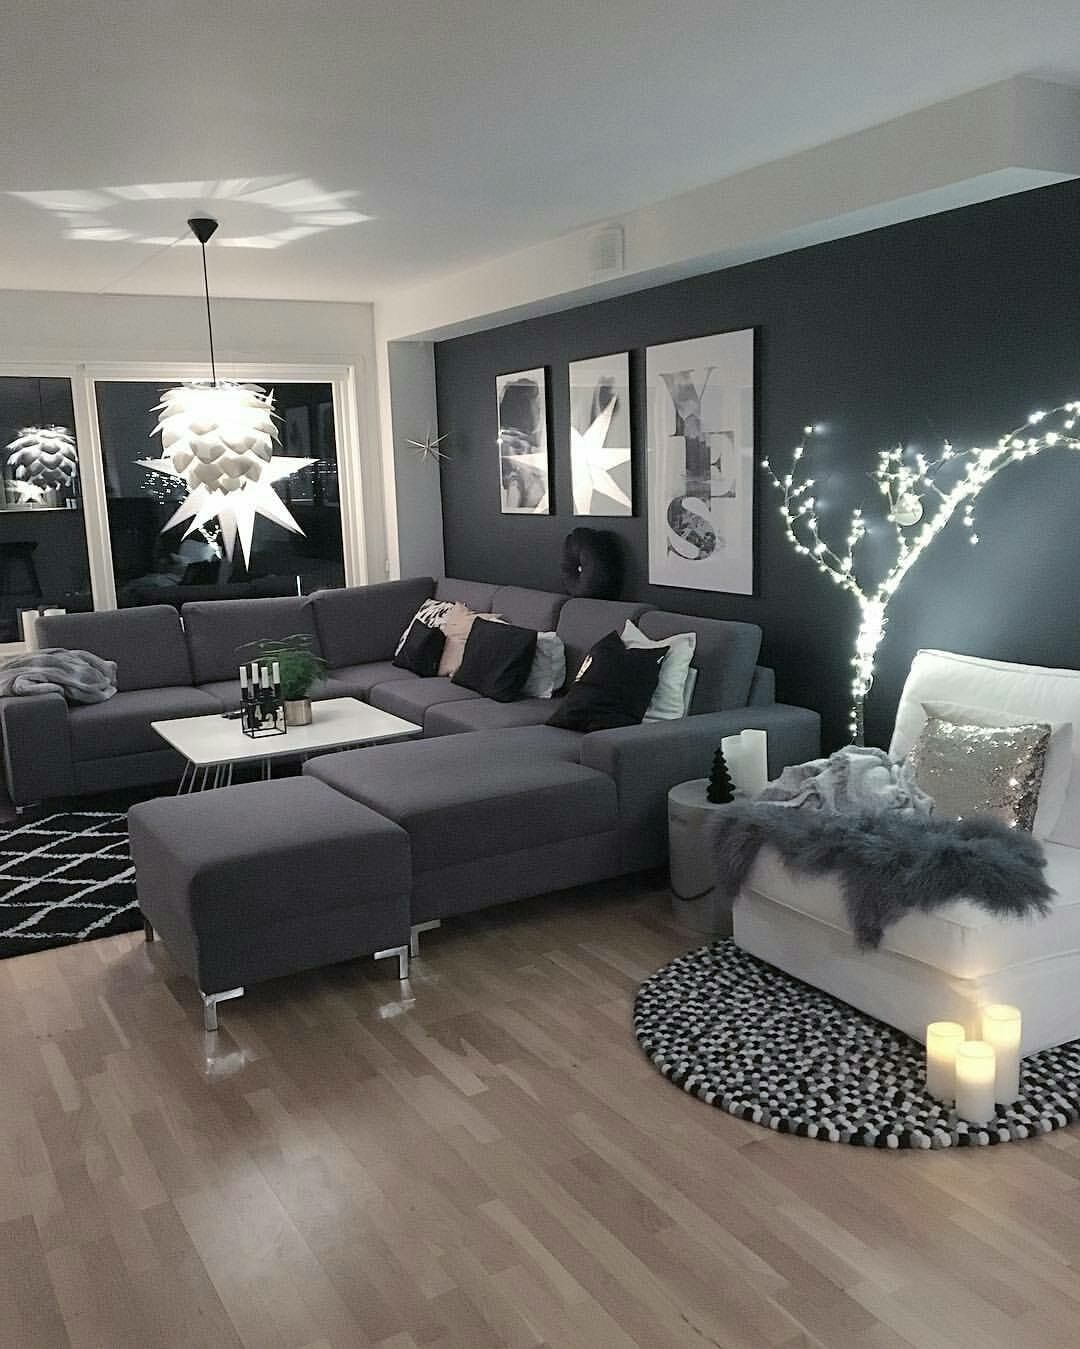 Pin By Xoxokash On Dream Dark Grey Living Room Black